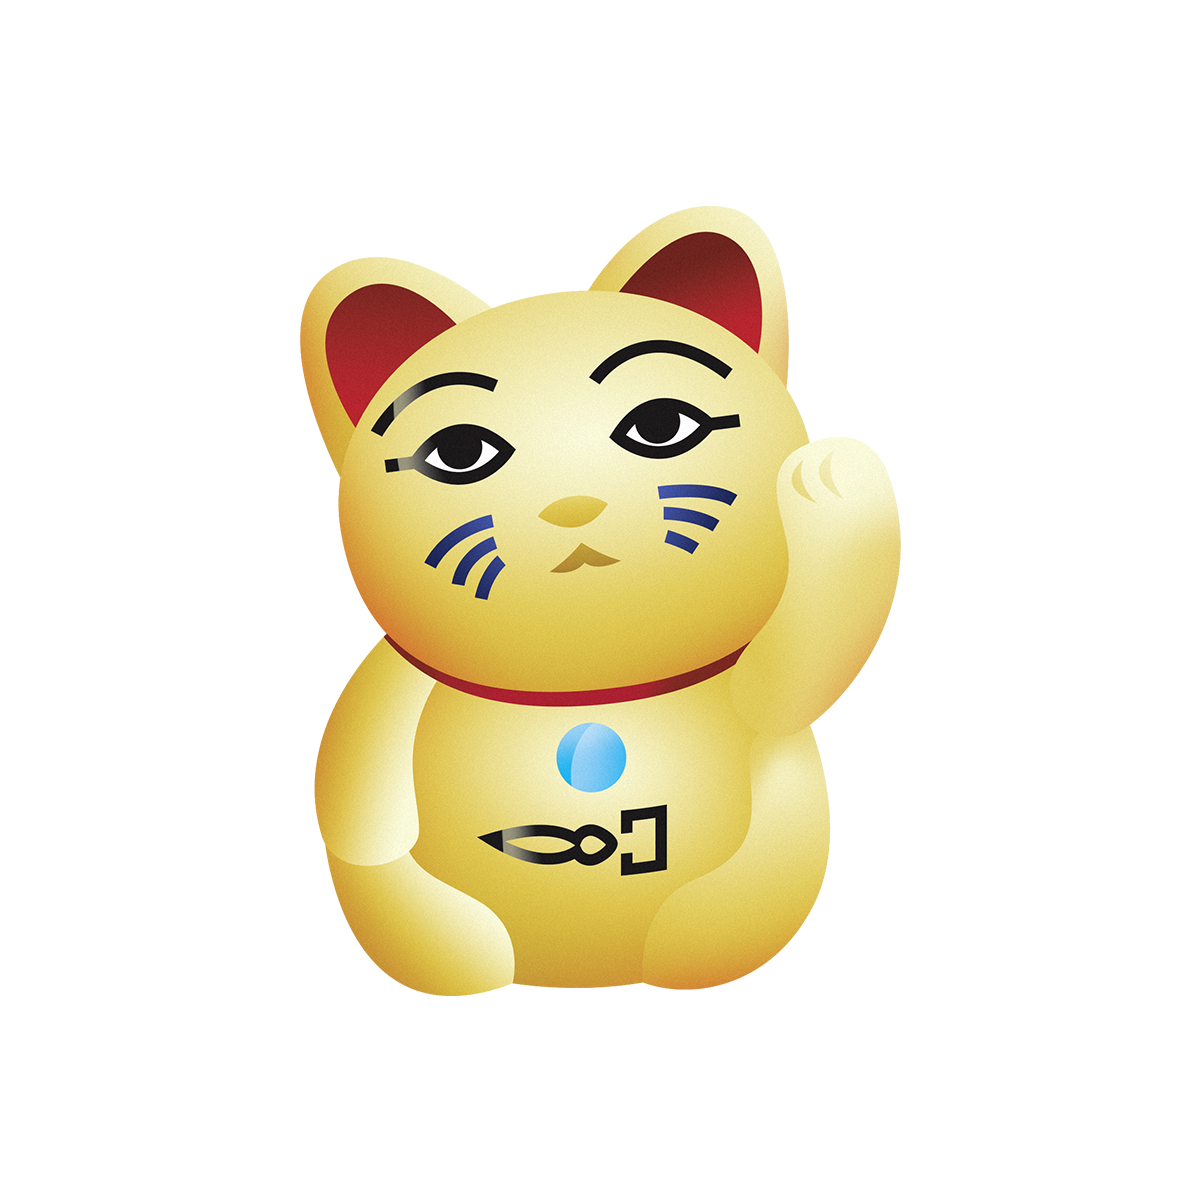 SEB_B-TBOE_eciRGB_06_Cat4